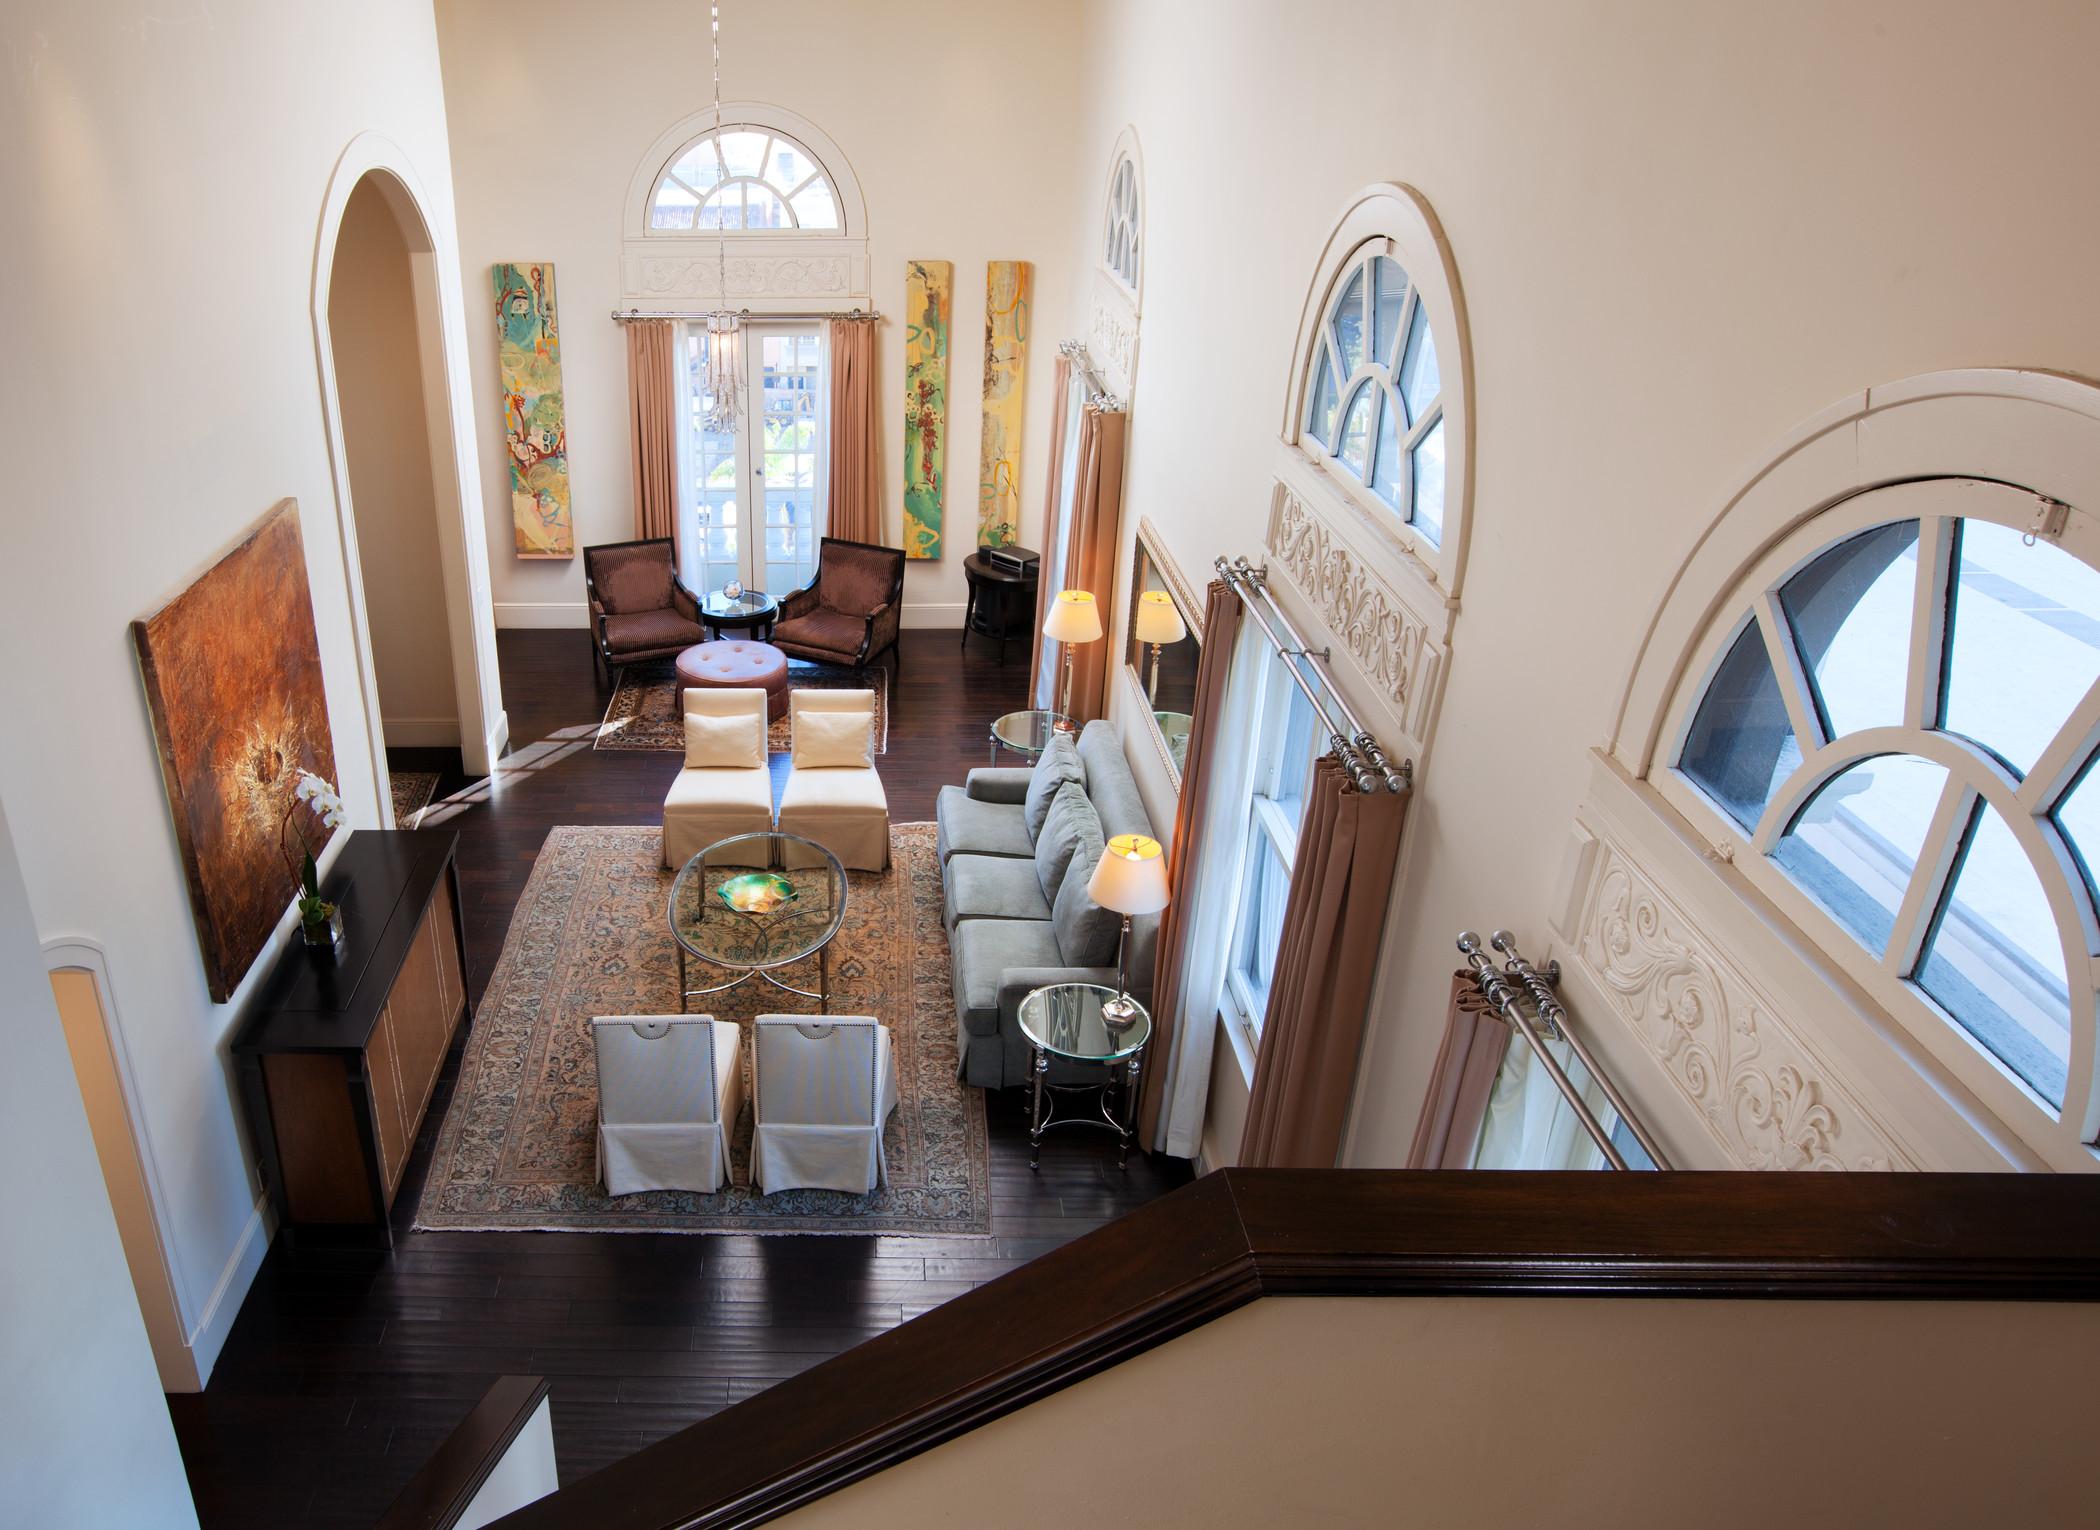 US GRANT Hotel Presidential Suite